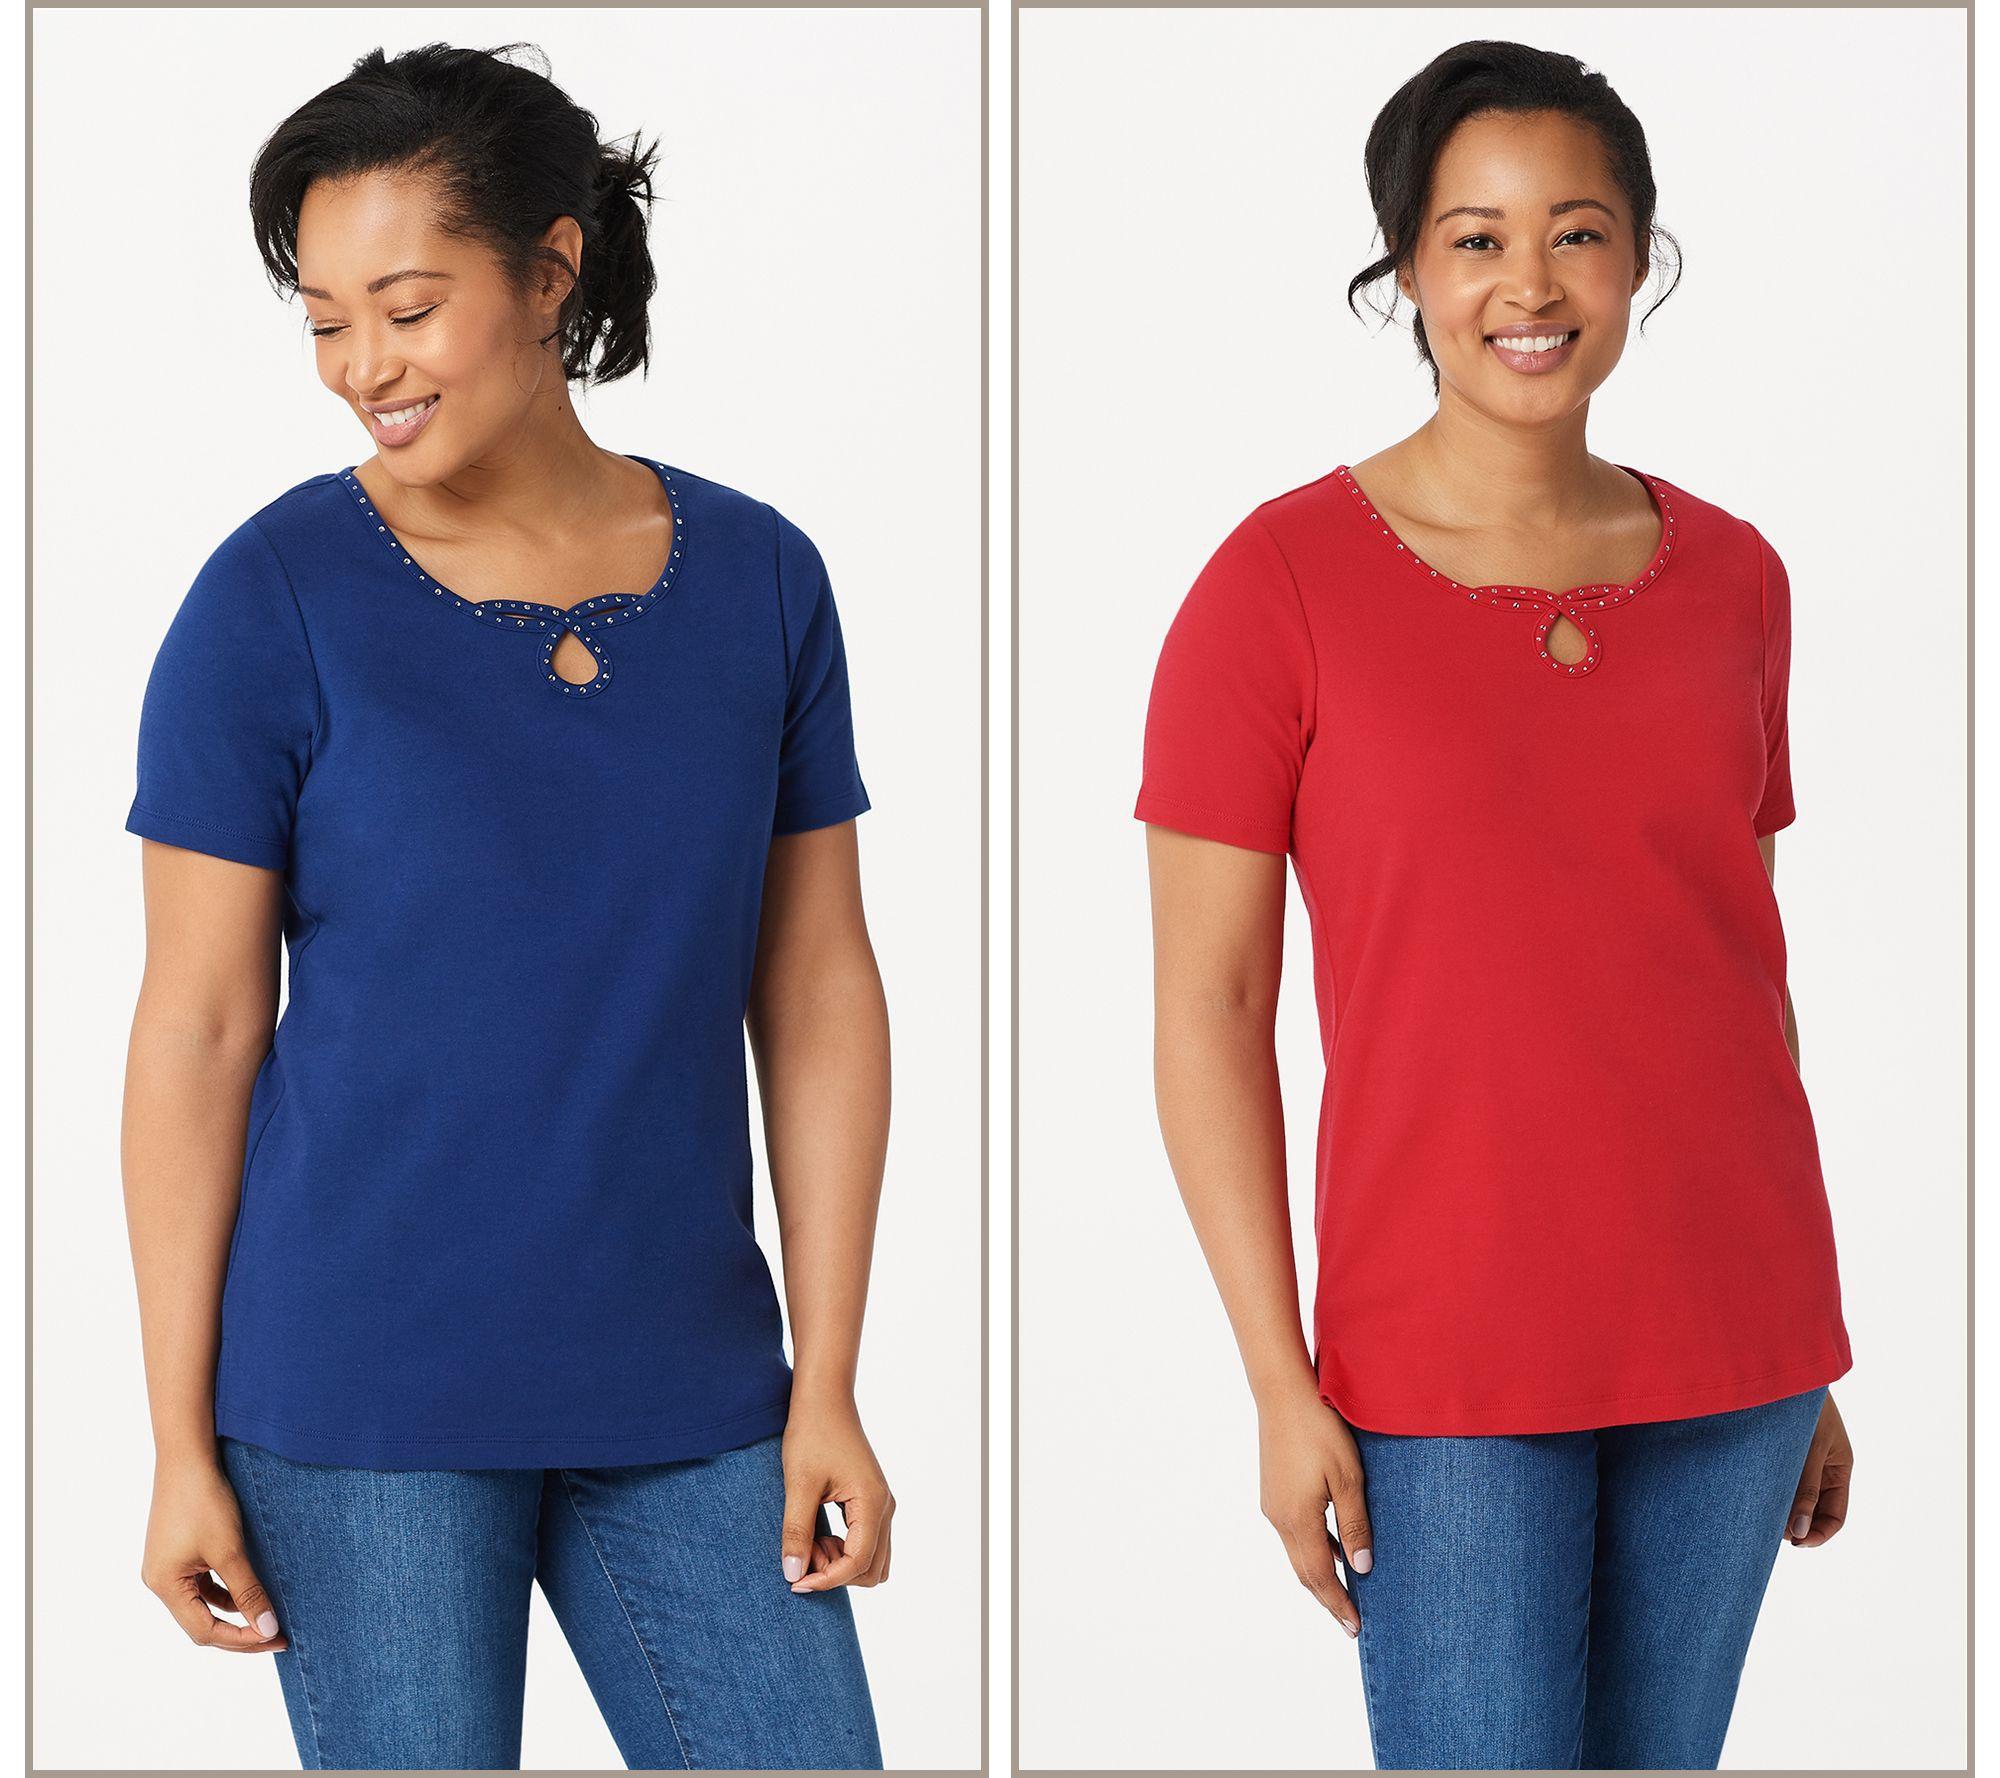 Golden Flash Light Womens V-Neck Short Sleeve T-Shirts